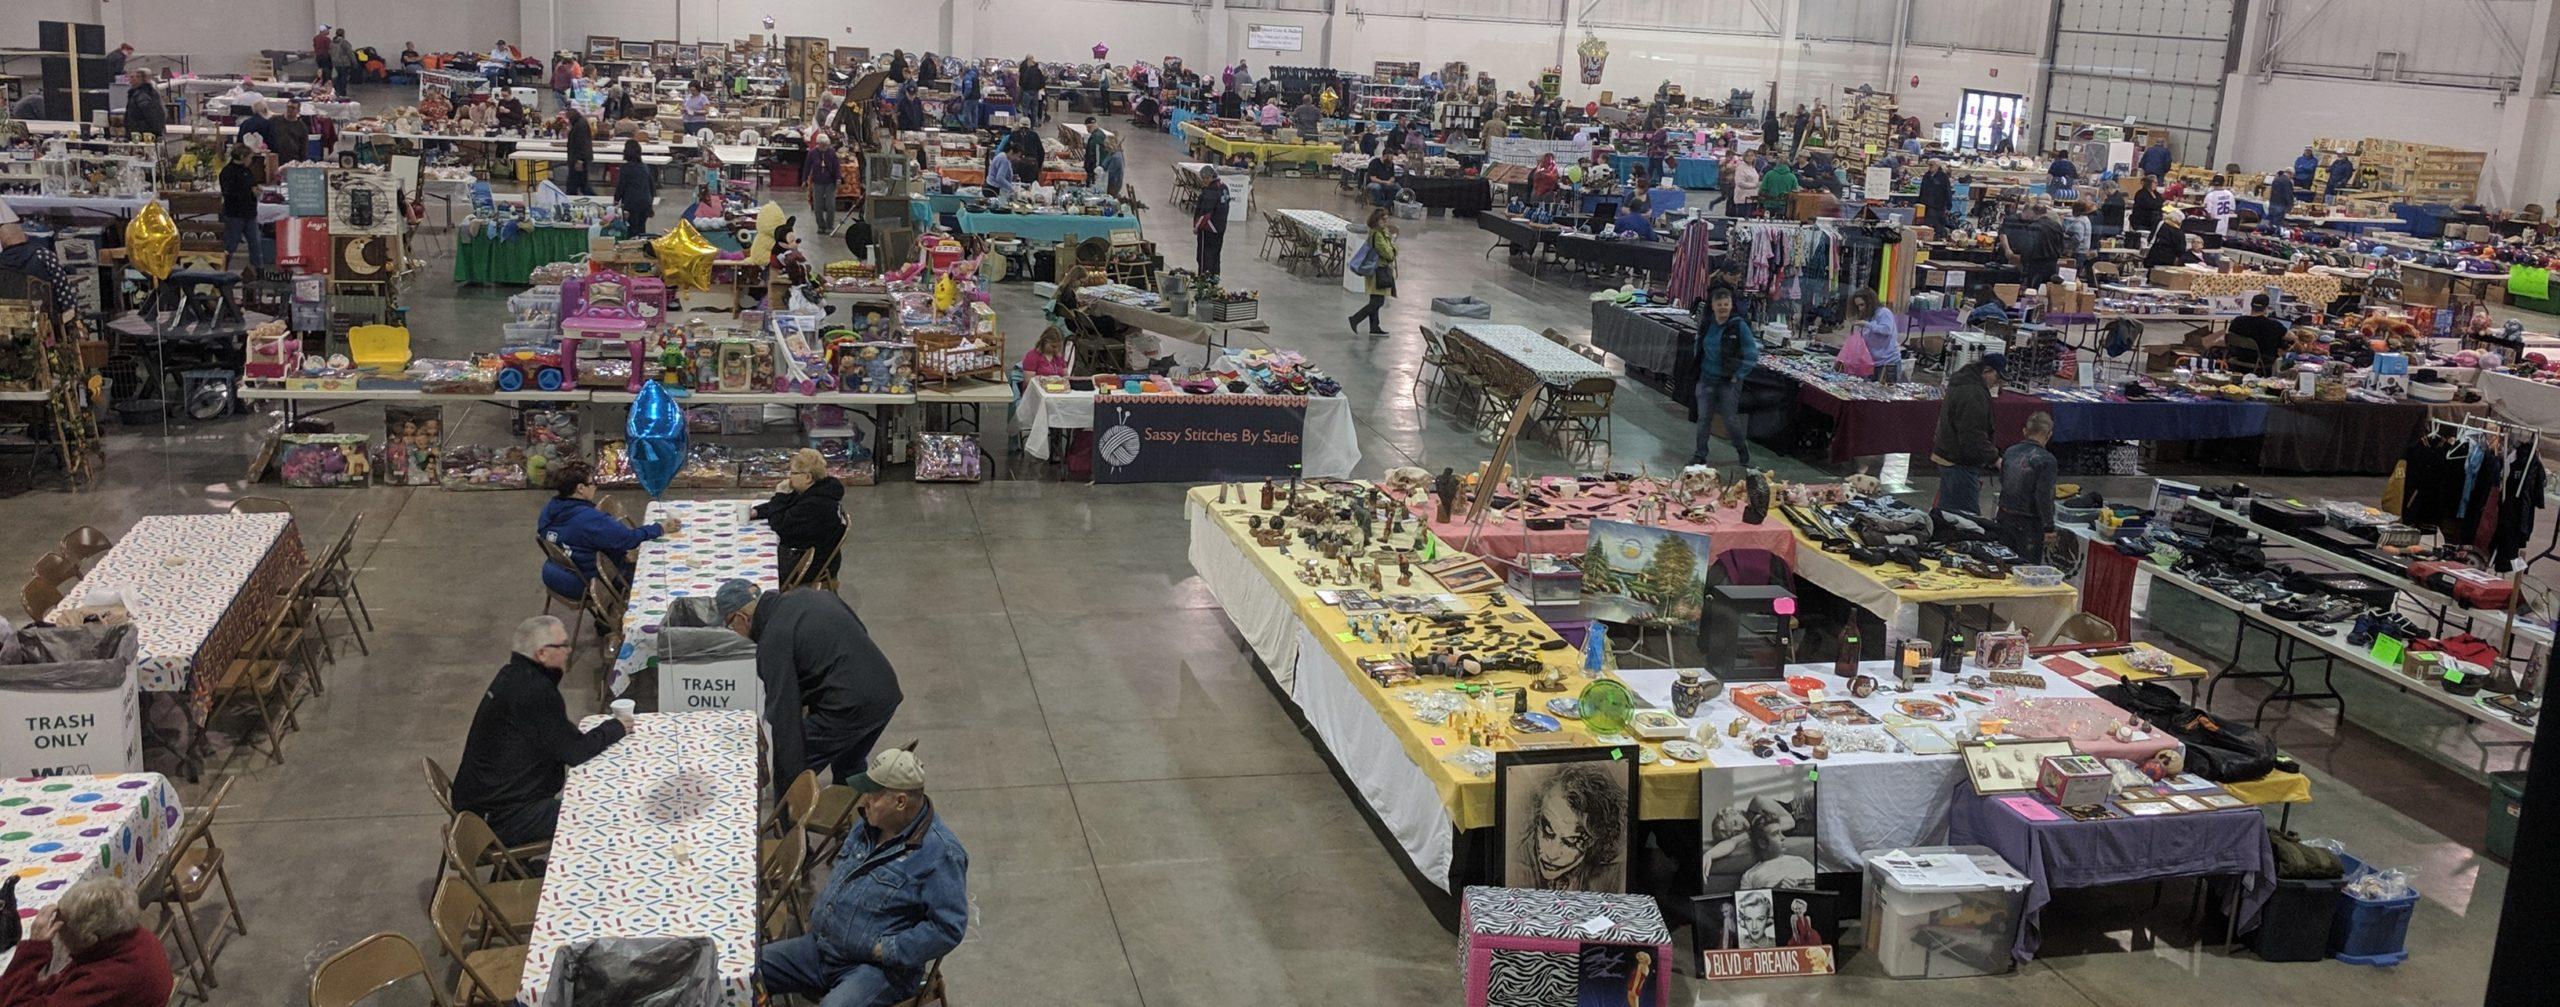 The Biggest Flea Market In North Dakota: 2020 Dates, Times, Information